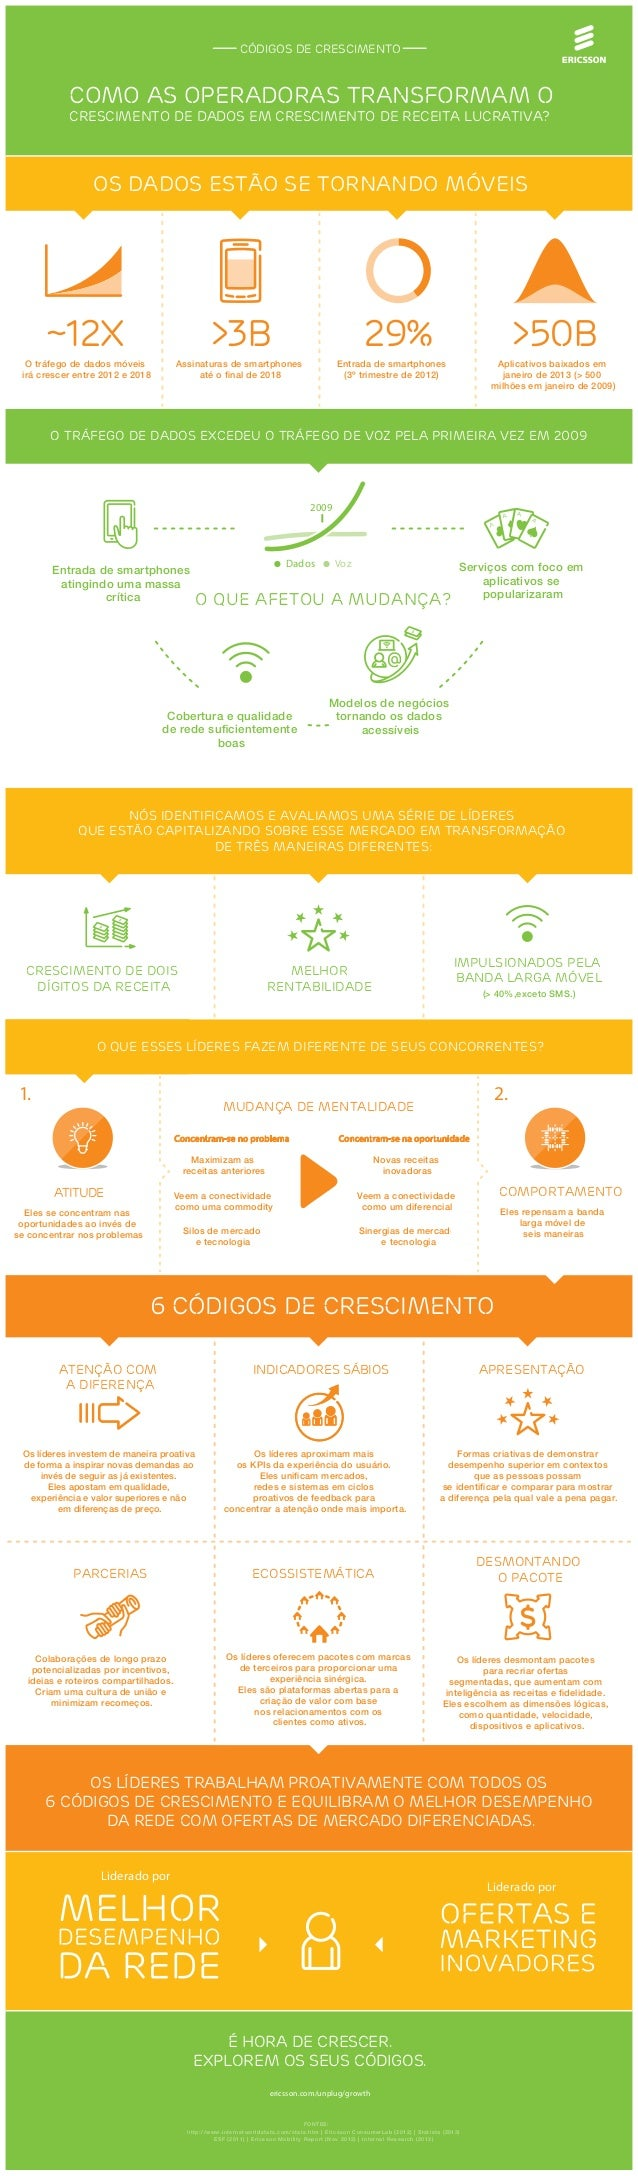 Códigos de crescimento Como as operadoras transformam o crescimento de dados em crescimento de receita lucrativa? APRESENT...